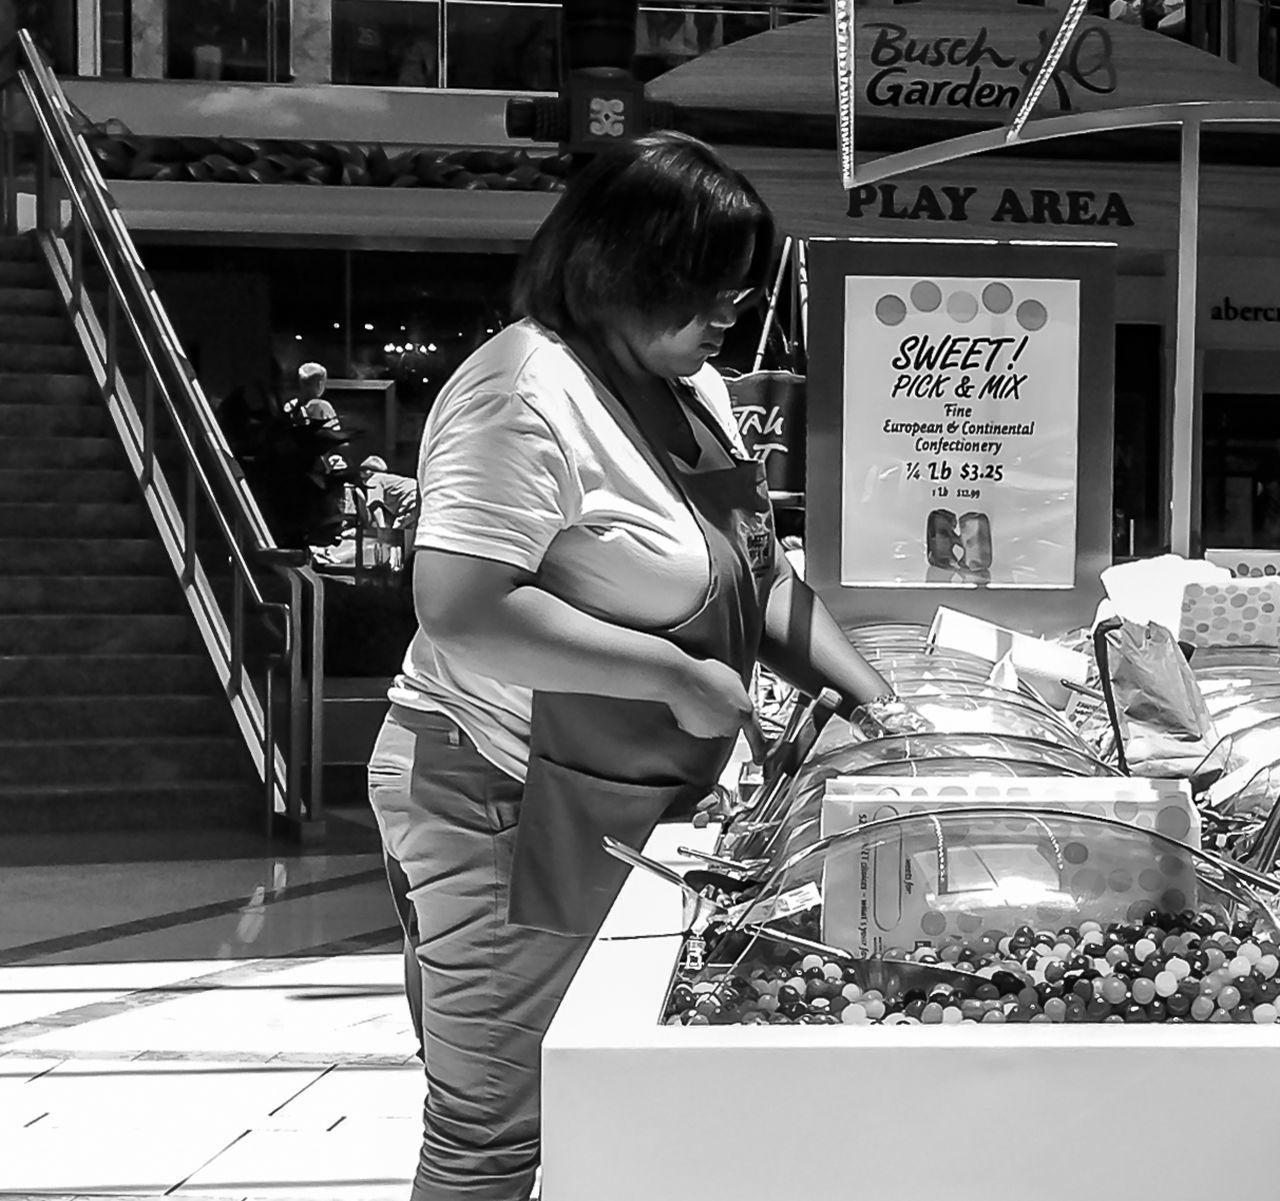 Black & White Blackandwhite Blackandwhite Photography IPhone Photography IPhoneography Iphonephotography Street Photography Streetphoto_bw Streetphotography